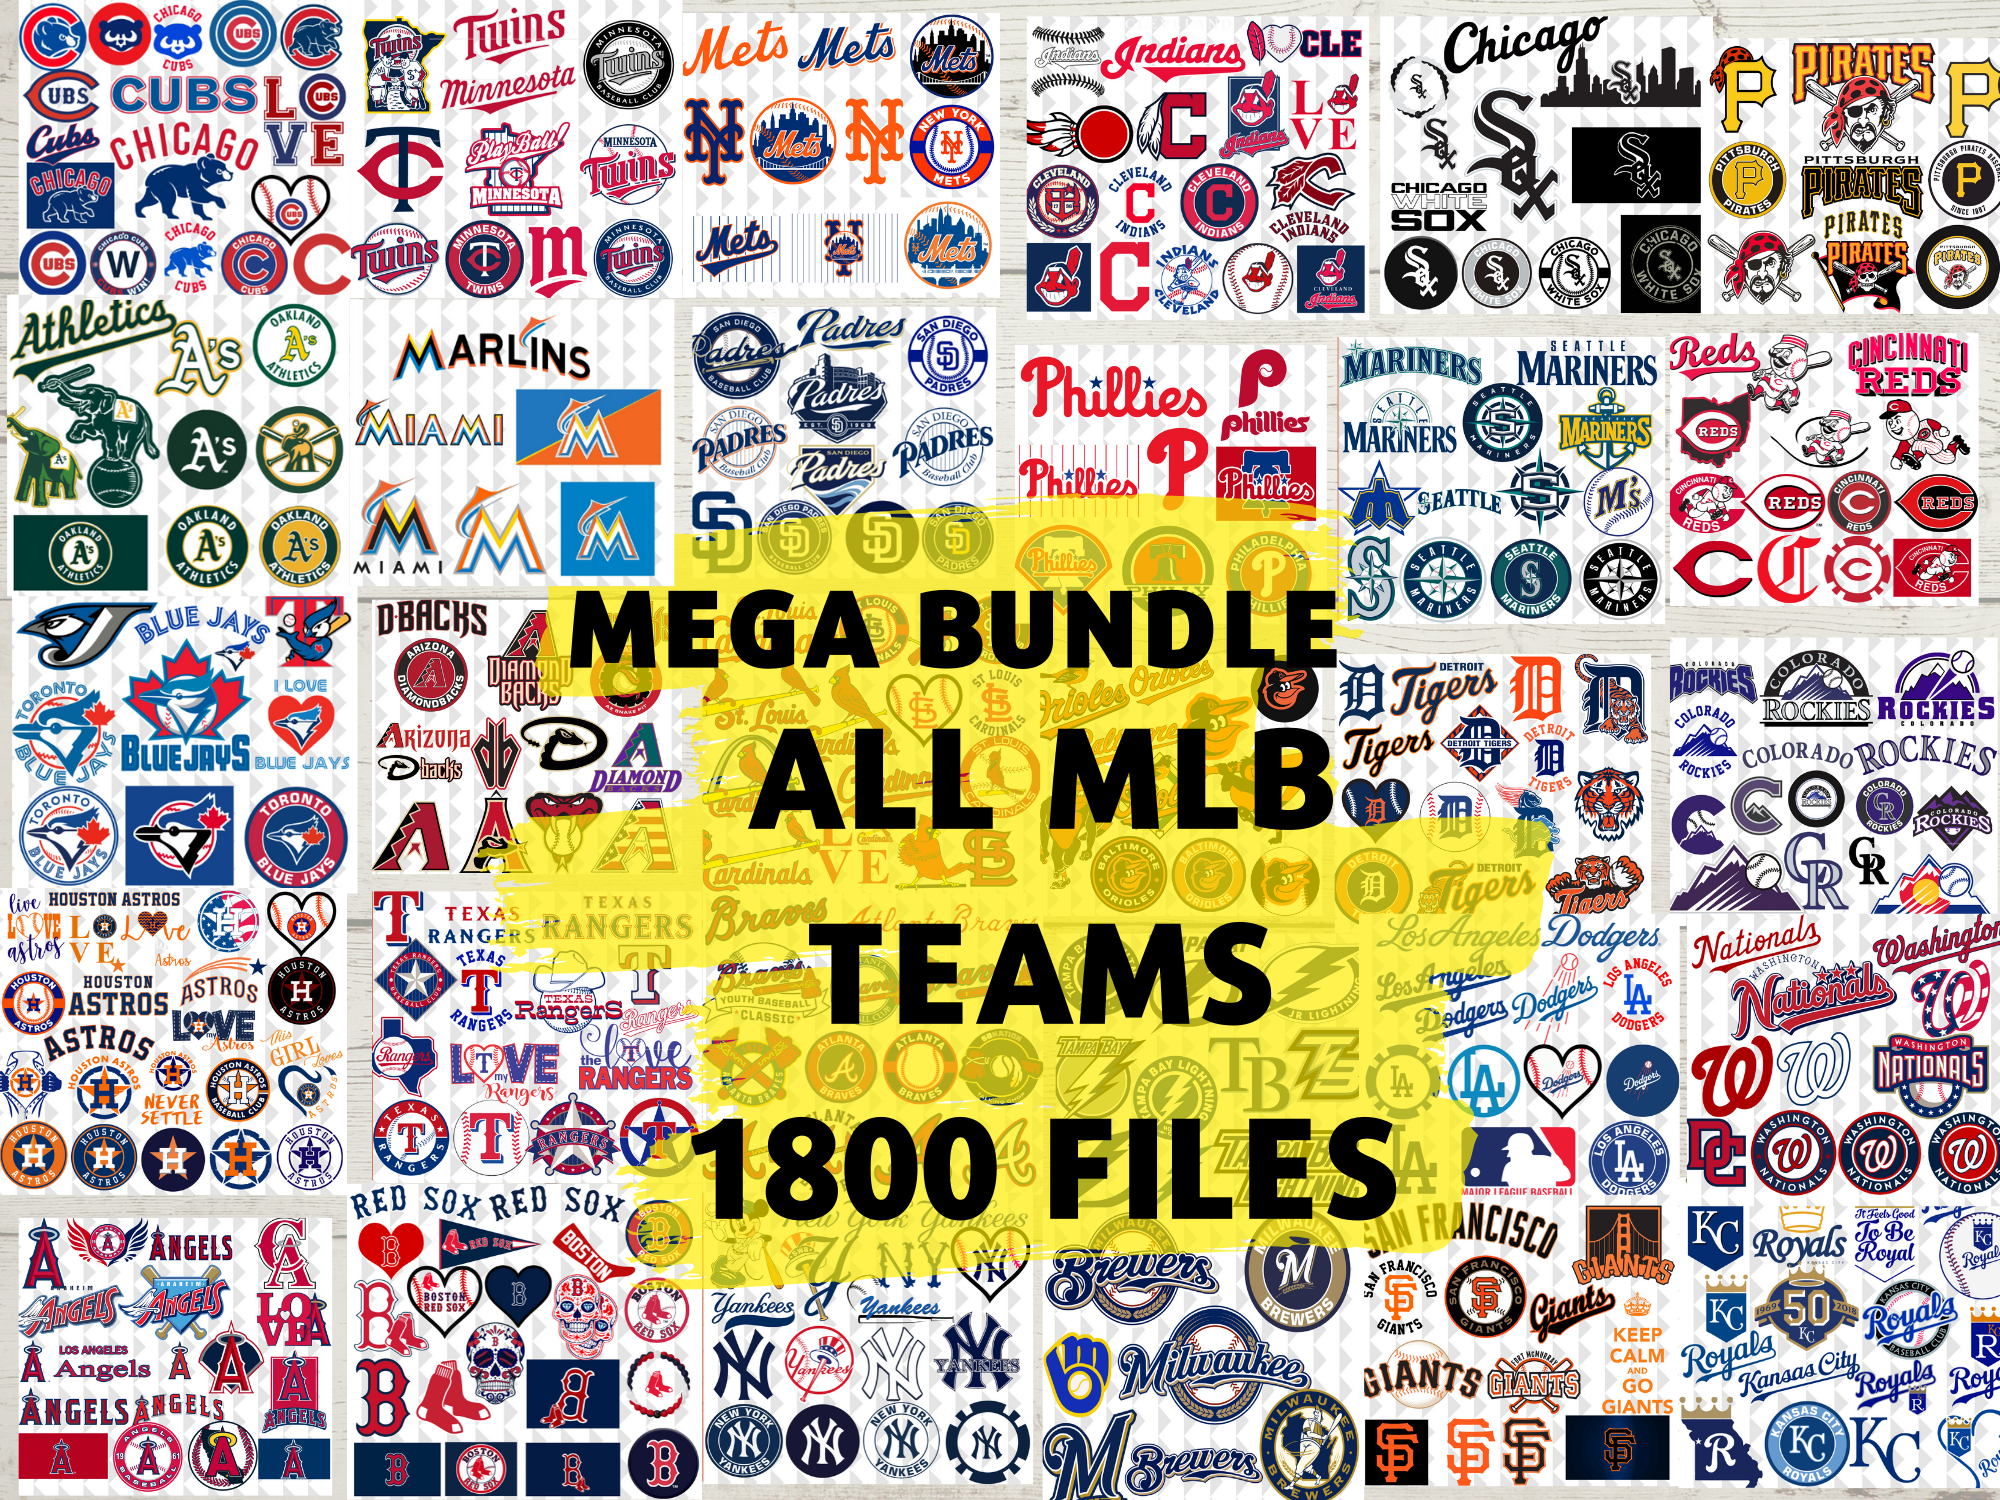 Clipartshop Bundle Baseball Team Bundle Of All Mlb Teams Clipart File Logo Teams Svg Files Png Files Dxf Files Ai Files In 2020 All Mlb Teams Mlb Team Logos Mlb Teams